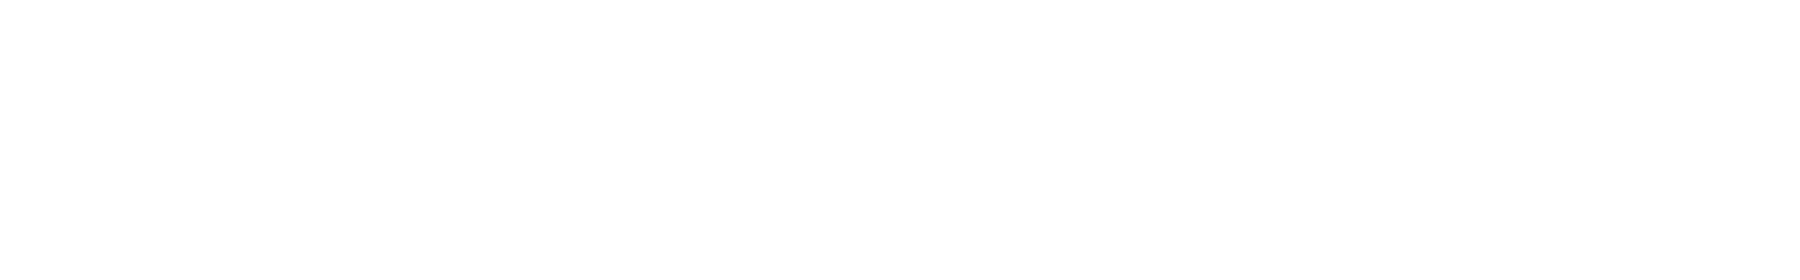 perc 1 29